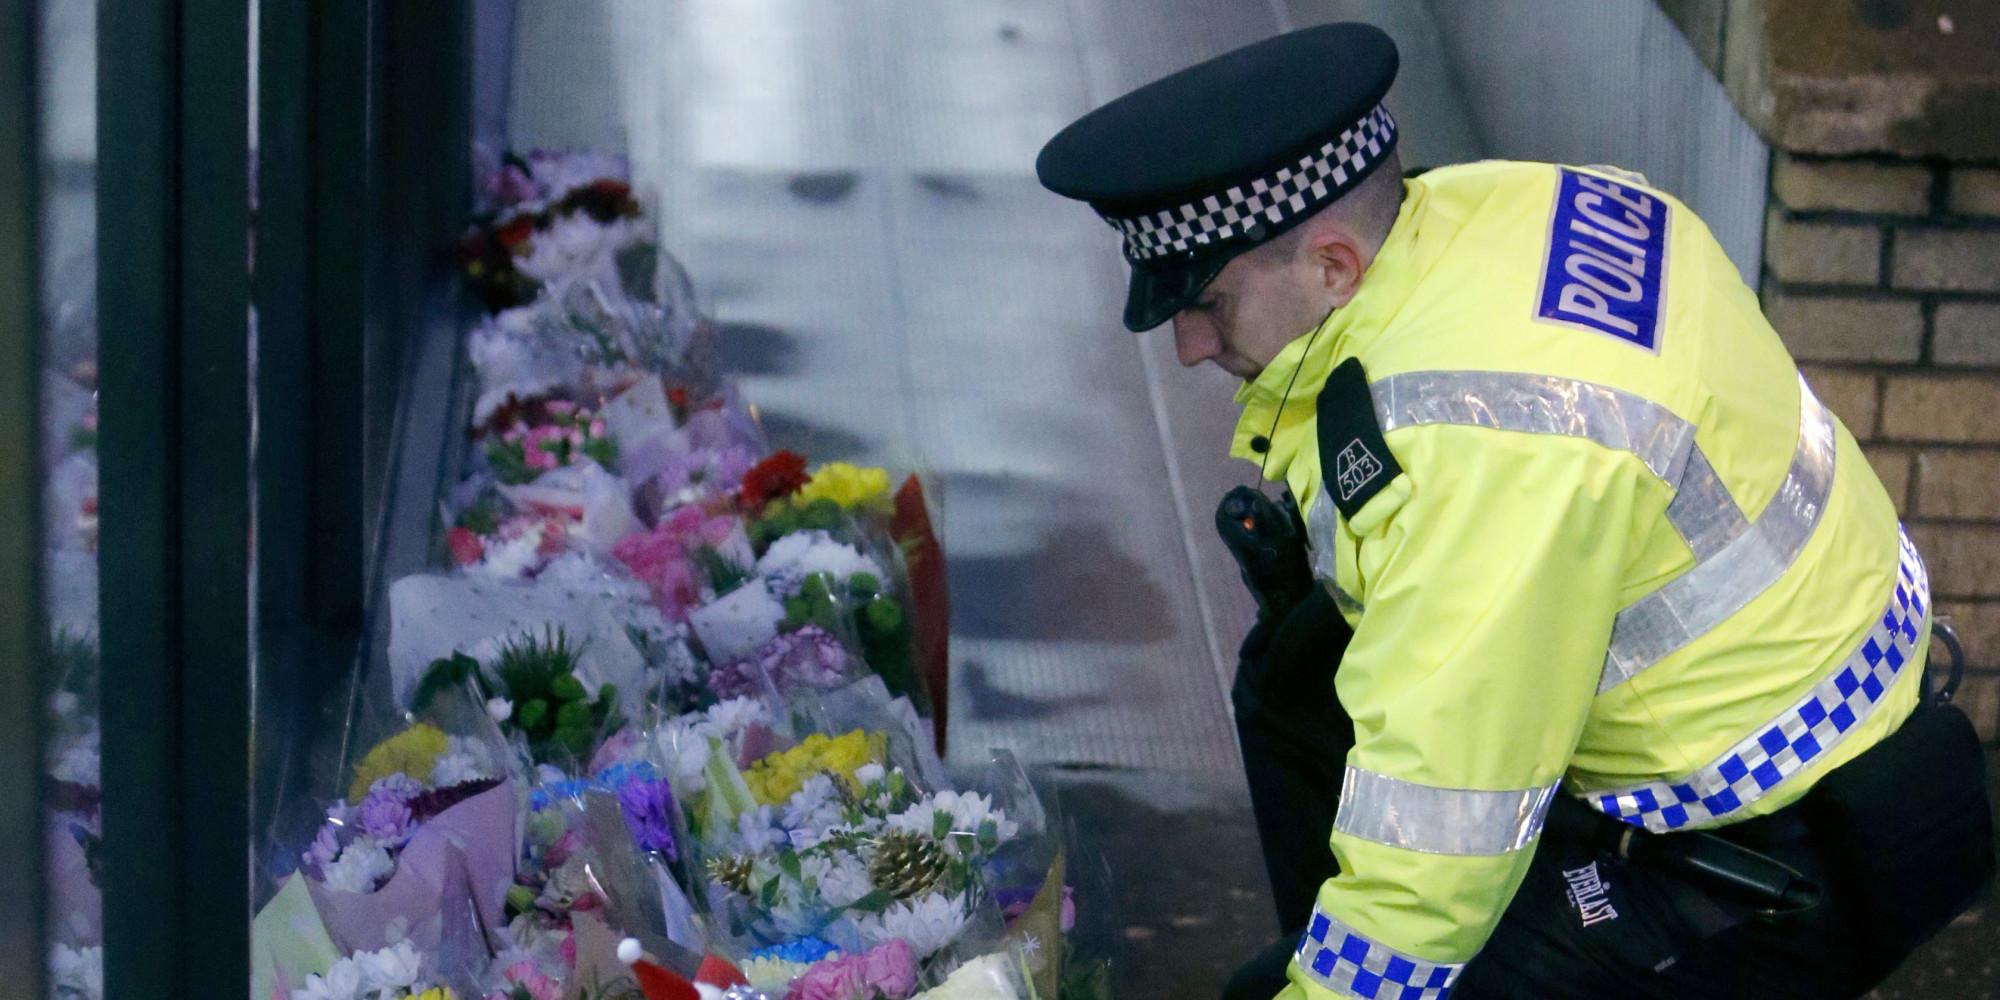 Glasgow 'Joke' Tweet Ends In Arrest For Sunderland Man